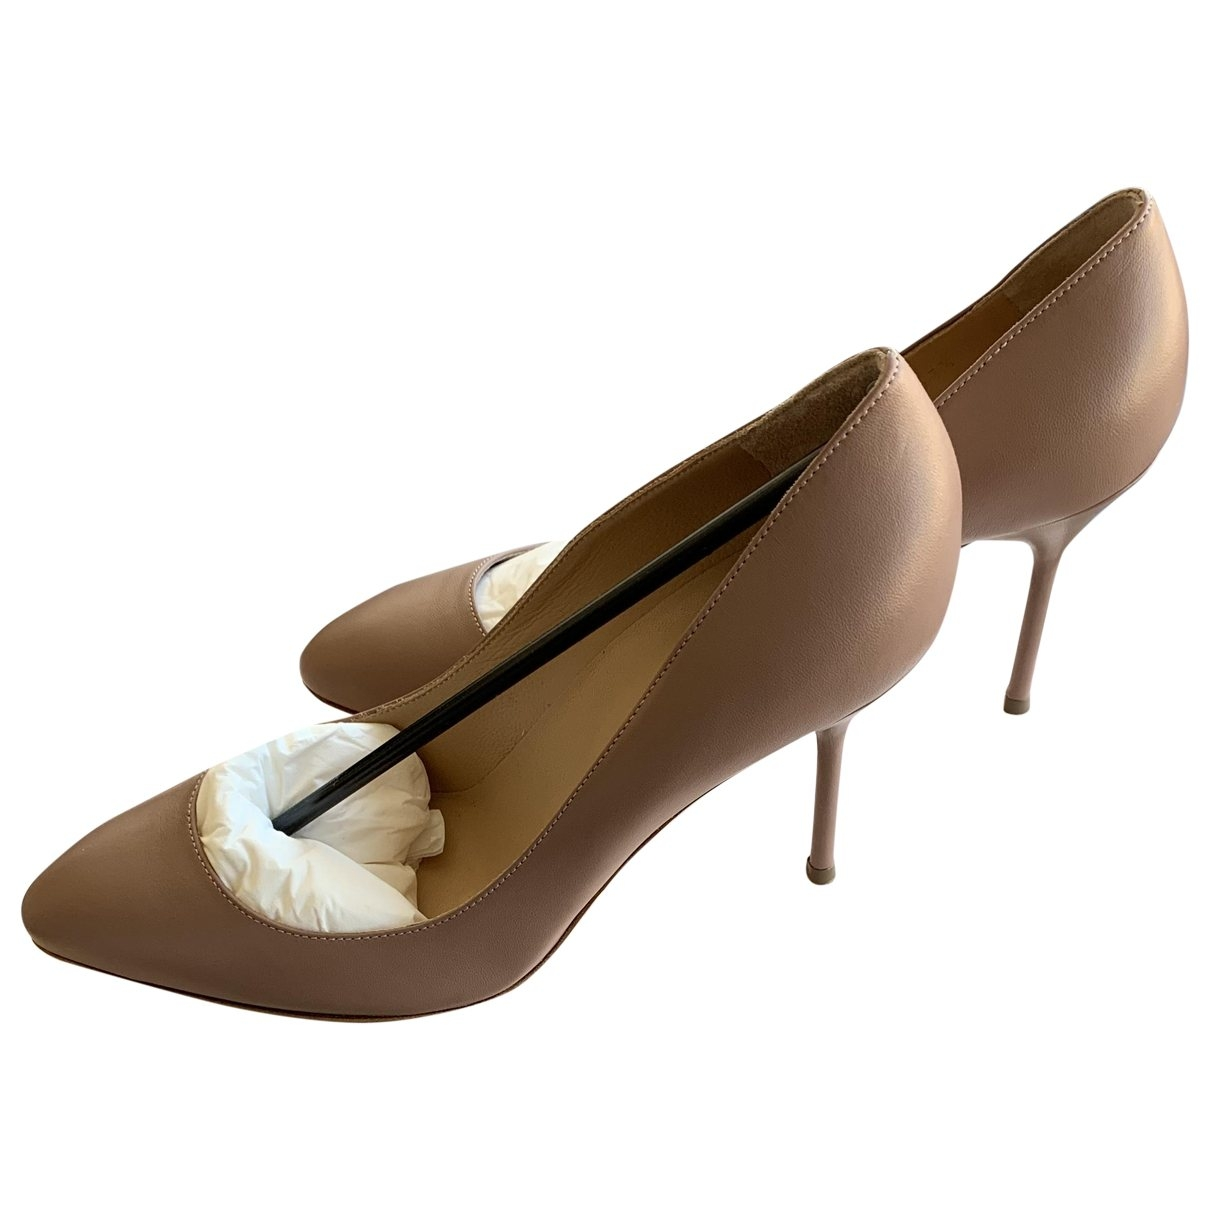 Sergio Rossi \N Beige Leather Heels for Women 37.5 EU